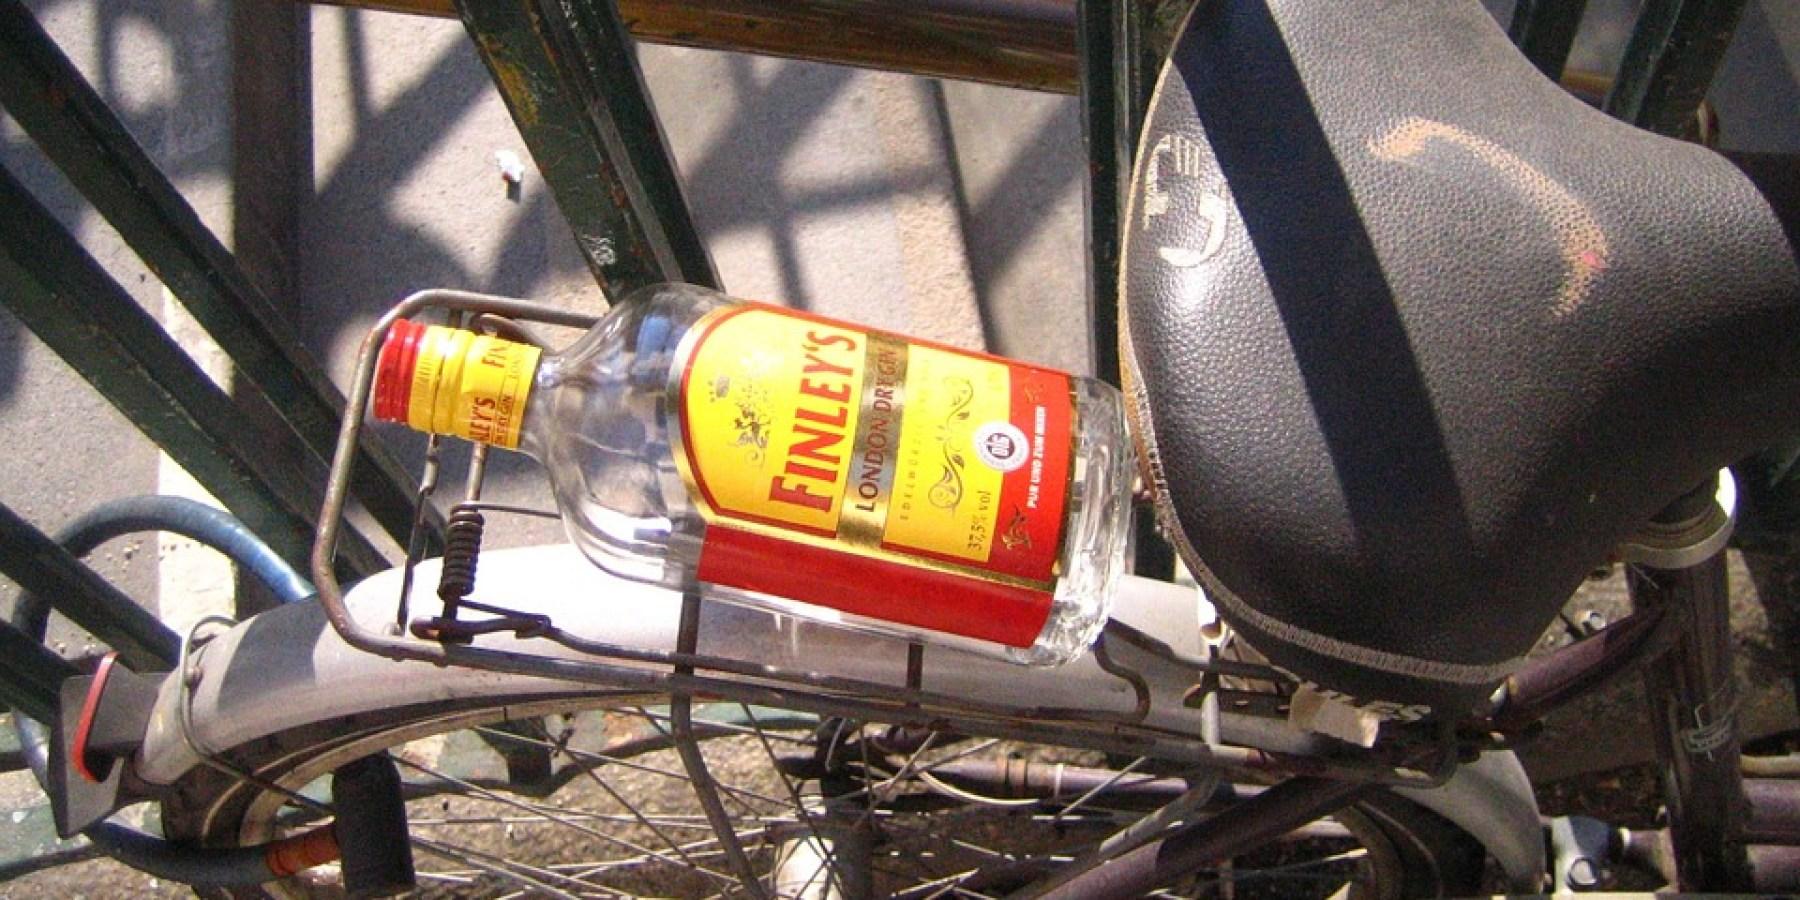 Polizisten stoppen 18-jährige Radlerin unter Alkoholeinfluss